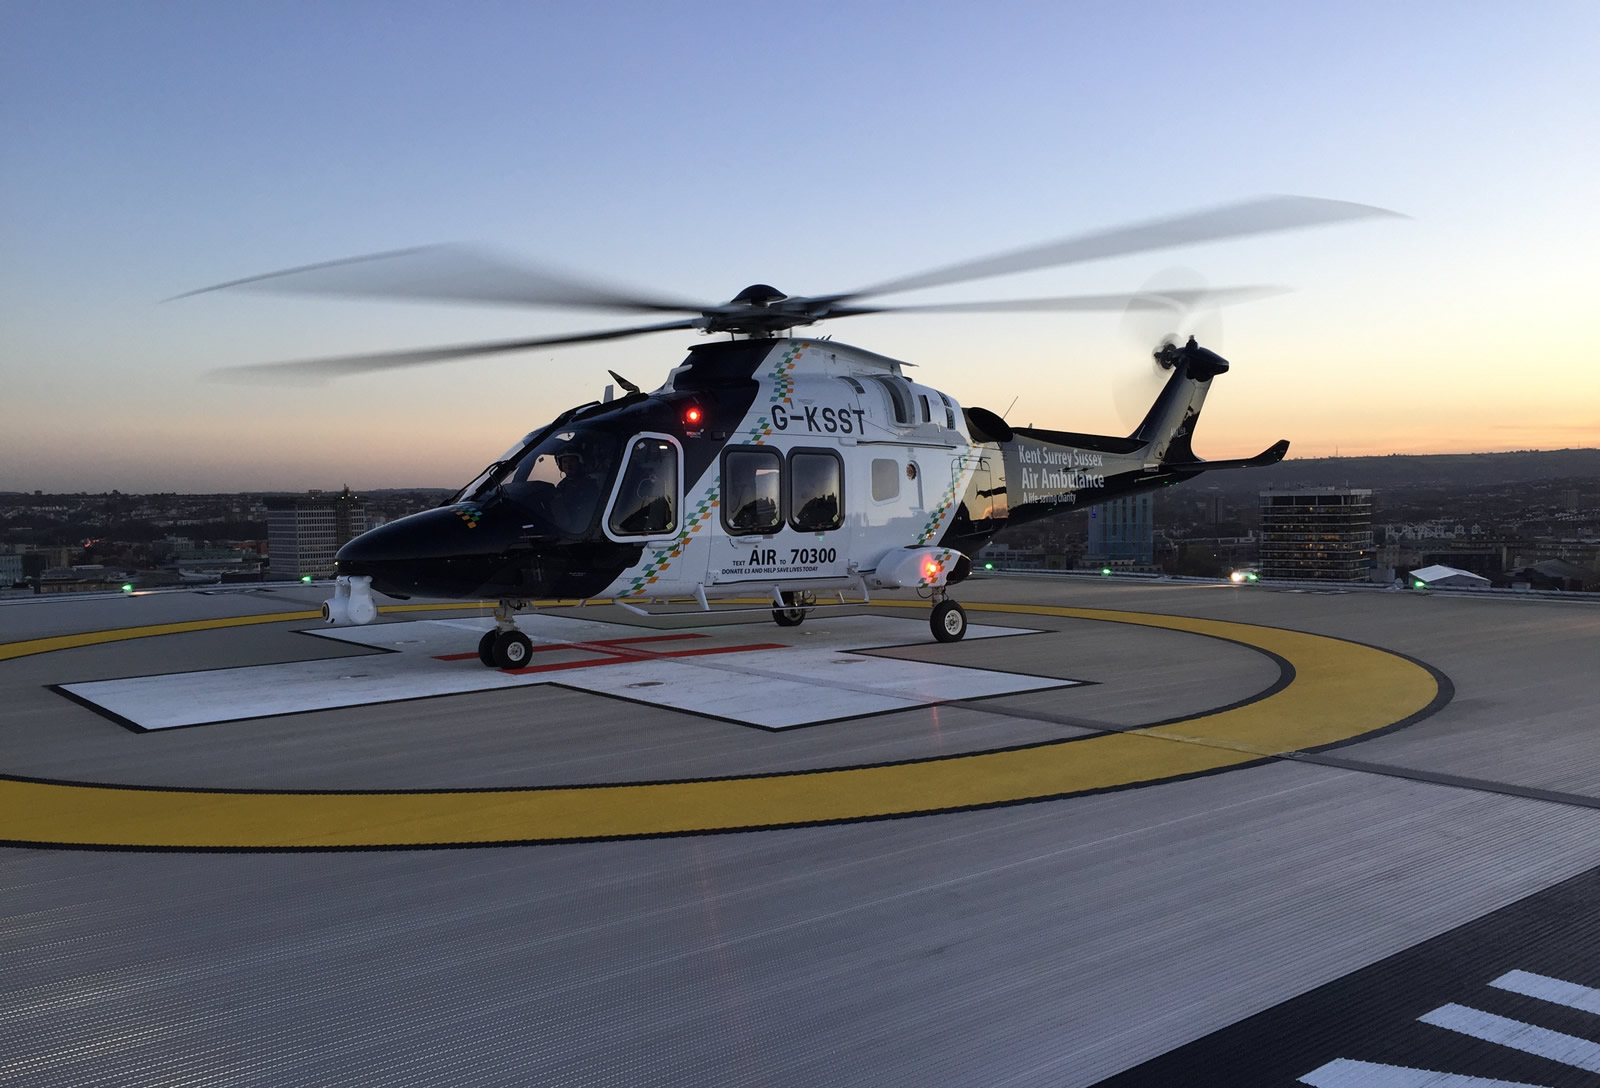 Kent, Surrey & Sussex Air Ambulance -AW169 Bristol Royal Infirmary Helipad Stationary Day